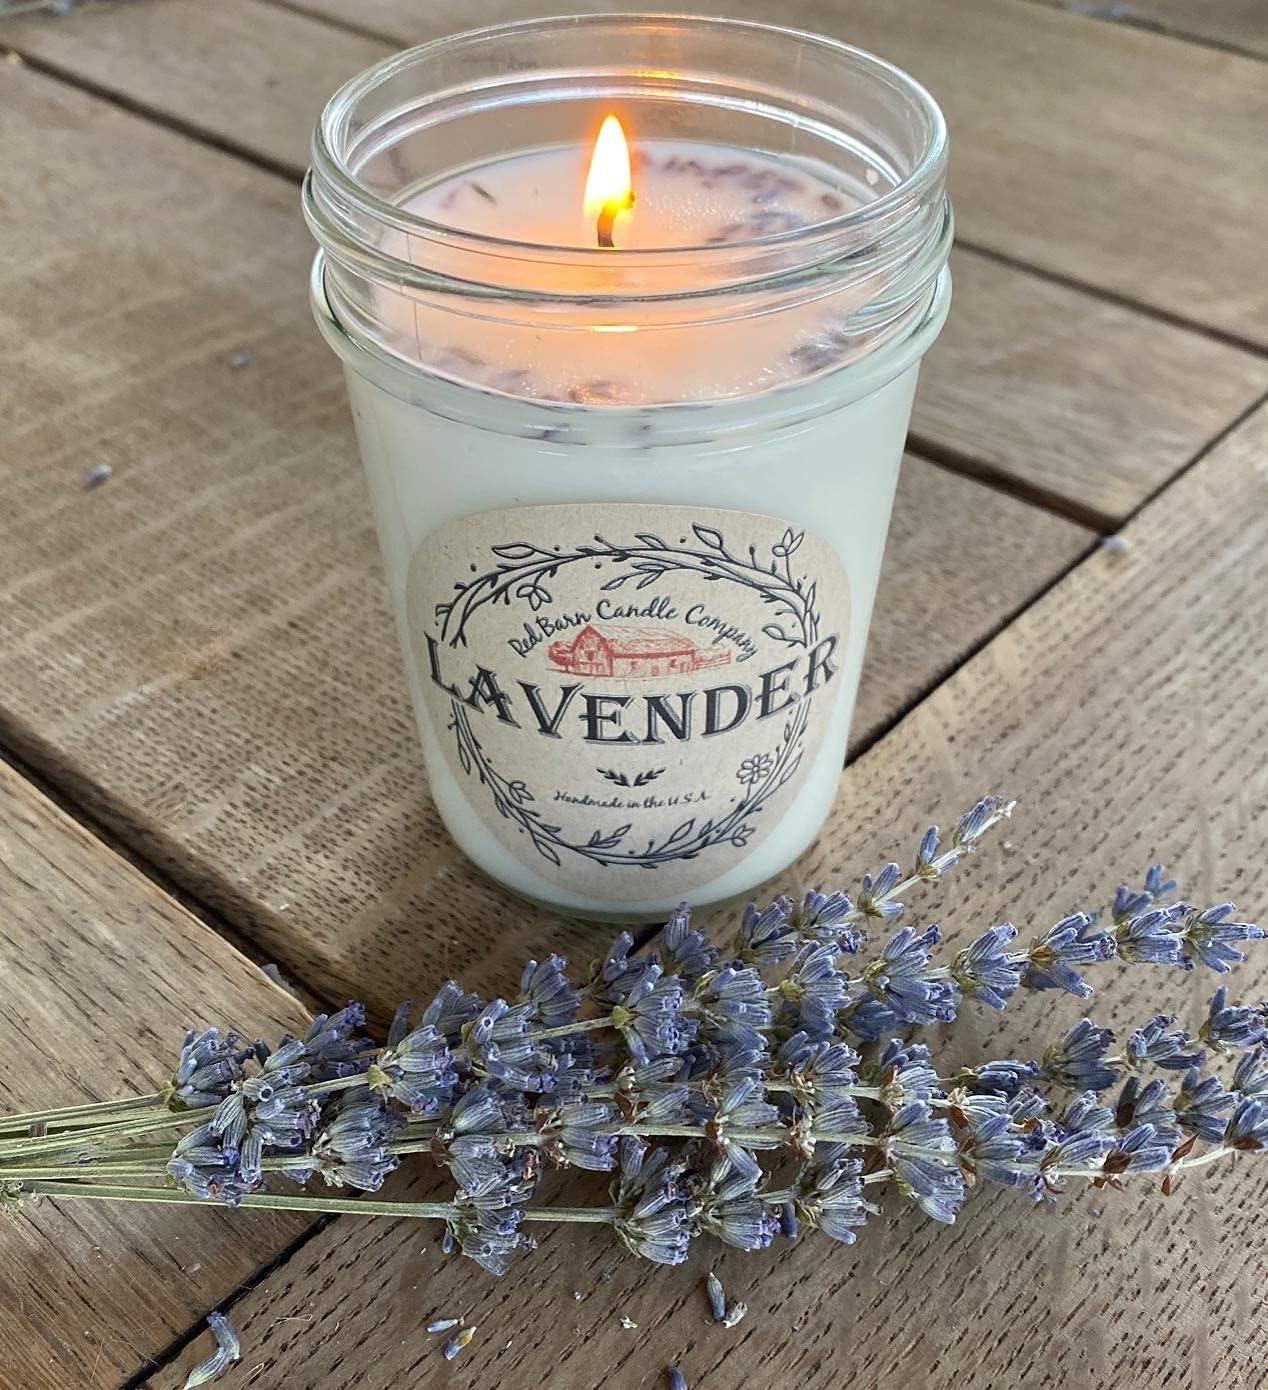 CARDAMOM /& VETIVER \u2022 Vetiver Scented Candle \u2022 Aromatherapy Candle \u2022 Kitchen Candle \u2022 Handmade Soy Wax Candles \u2022 Mason Jar Candles \u2022 Gifts